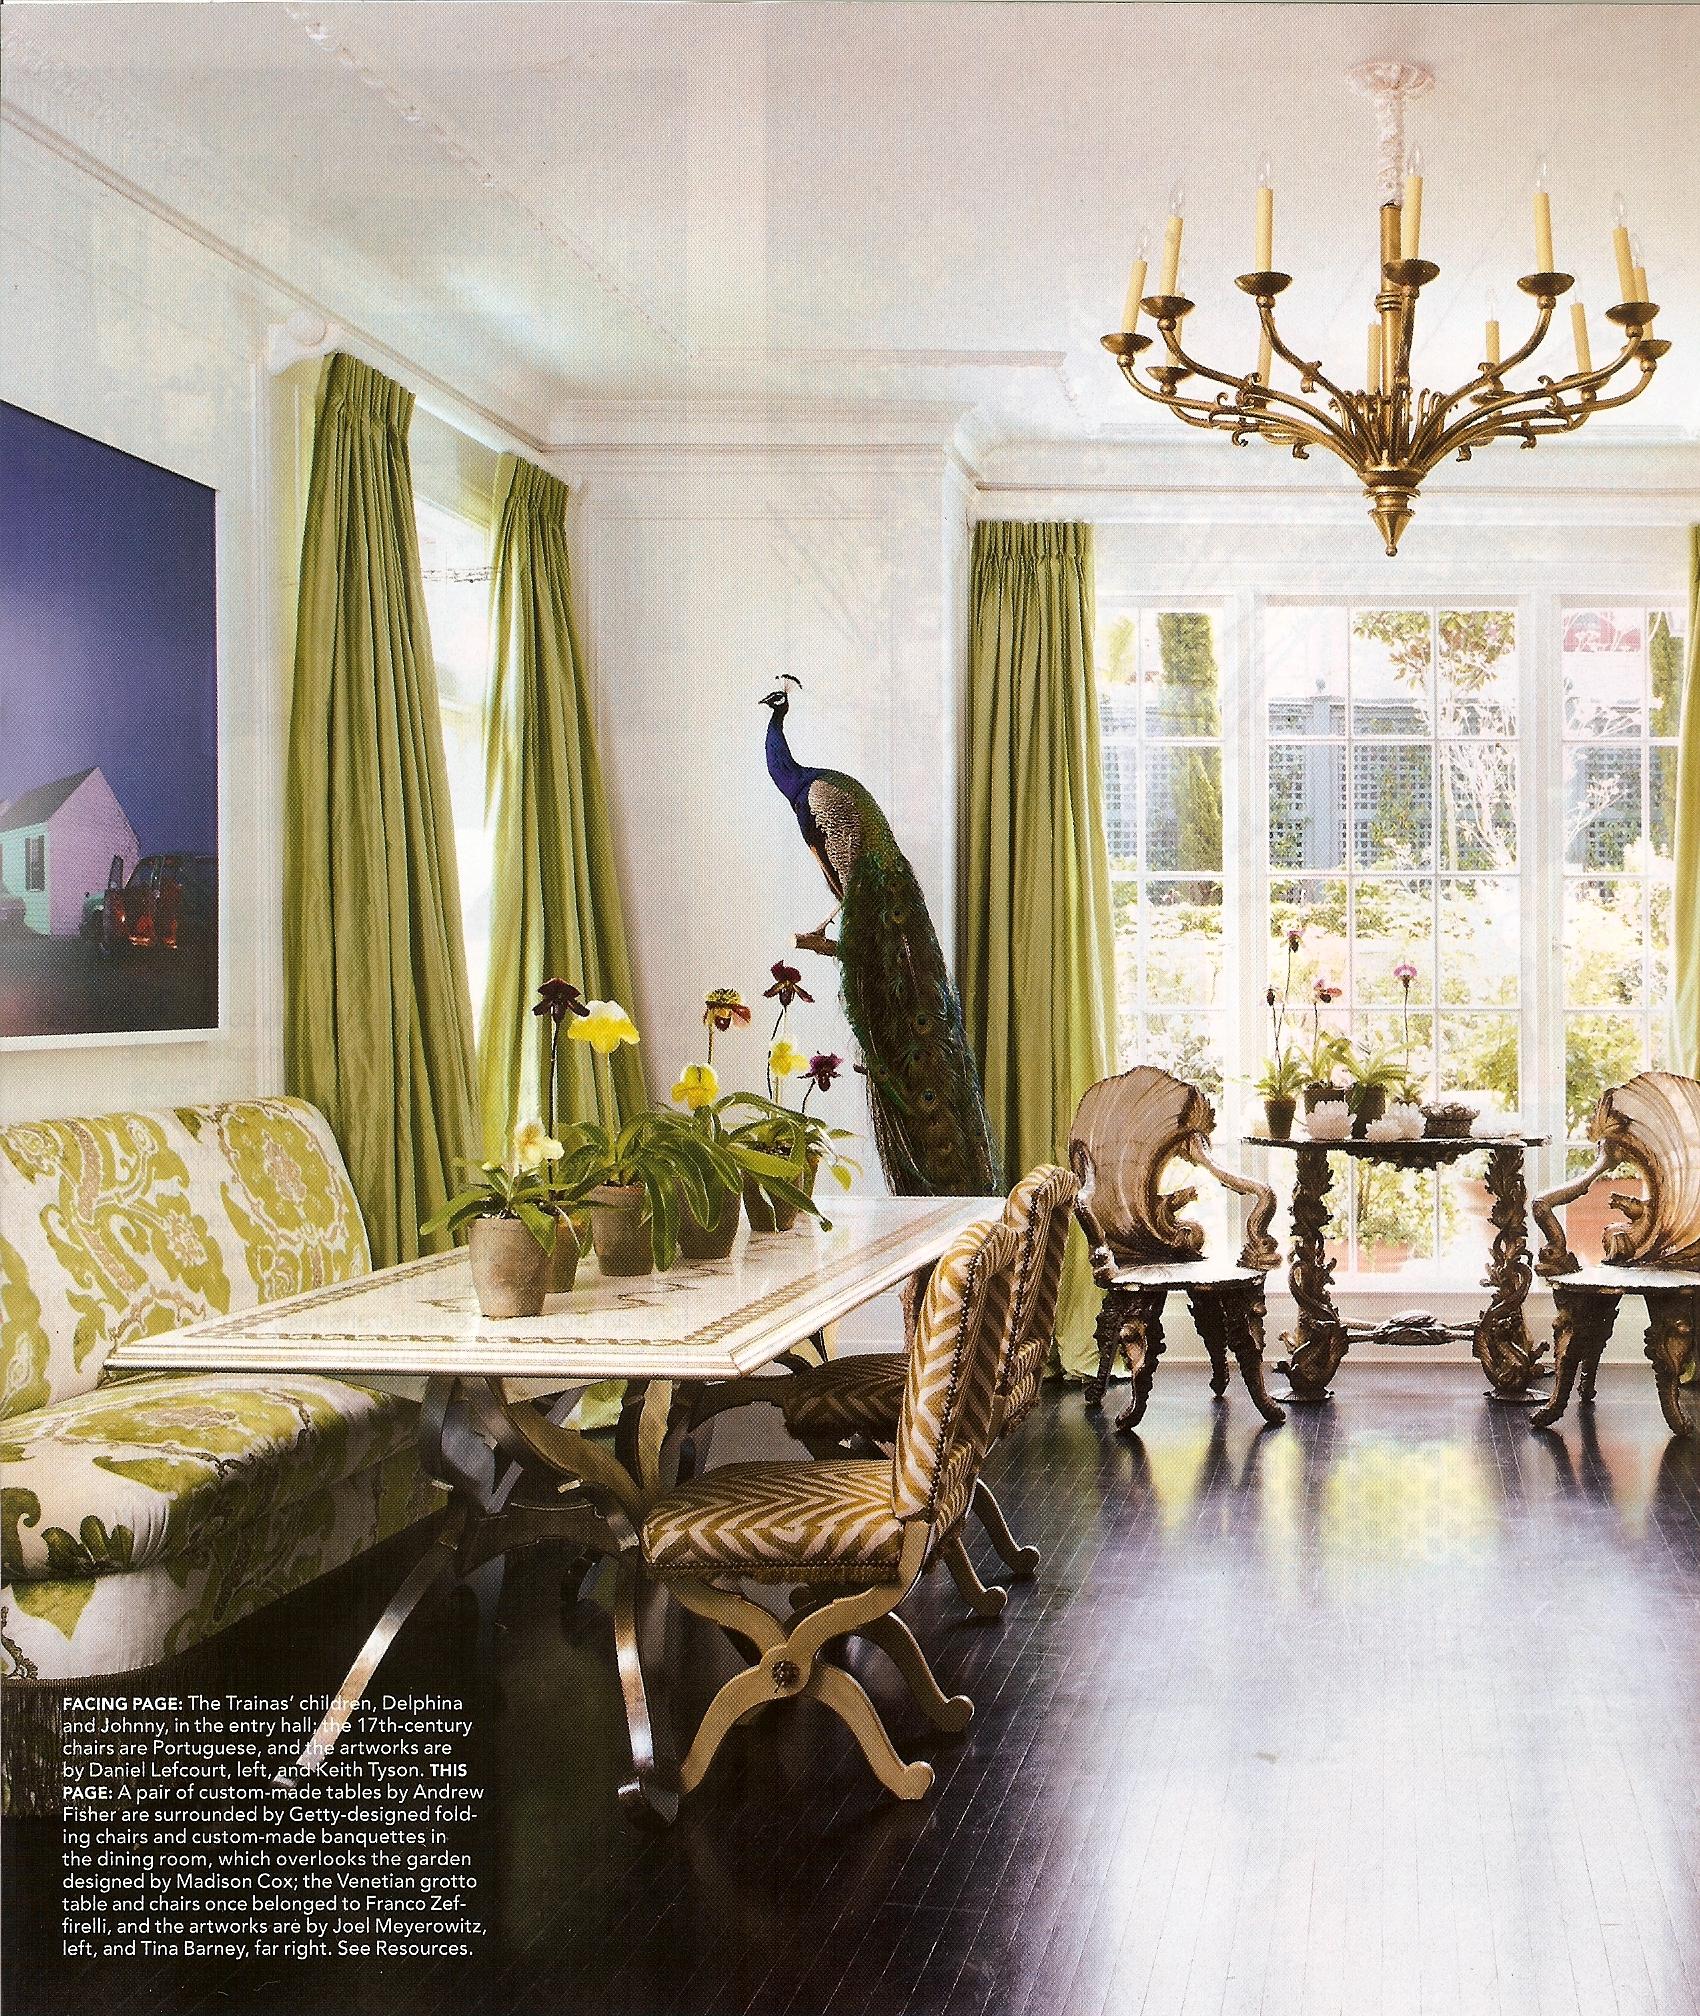 Antiques and Flea Markets « Decor Arts Now - Less Stuffed Design Trends